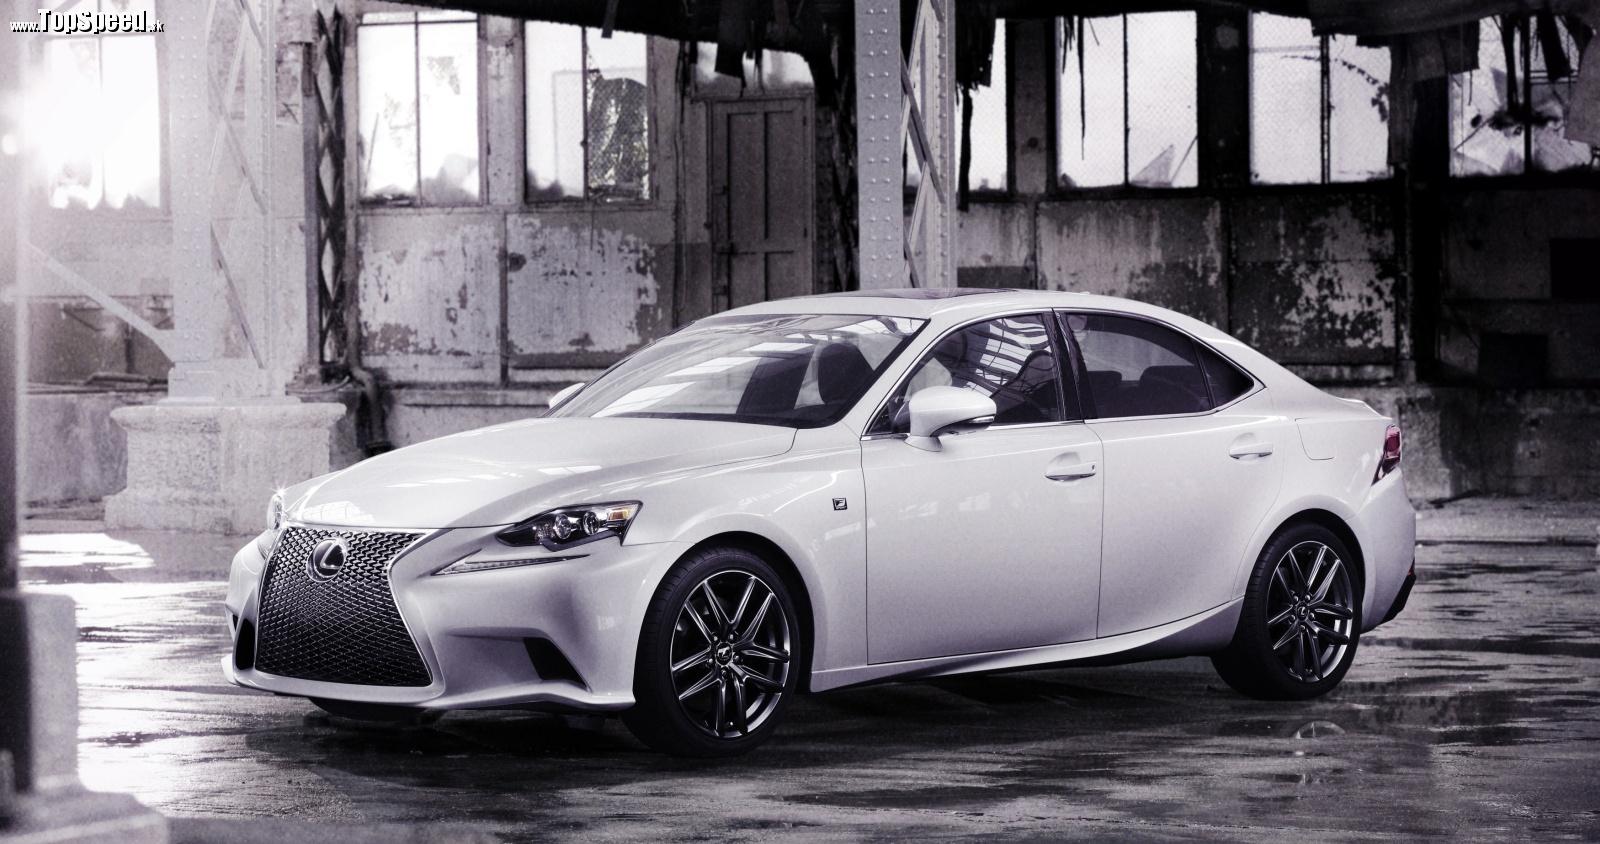 Lexus IS novej generácie